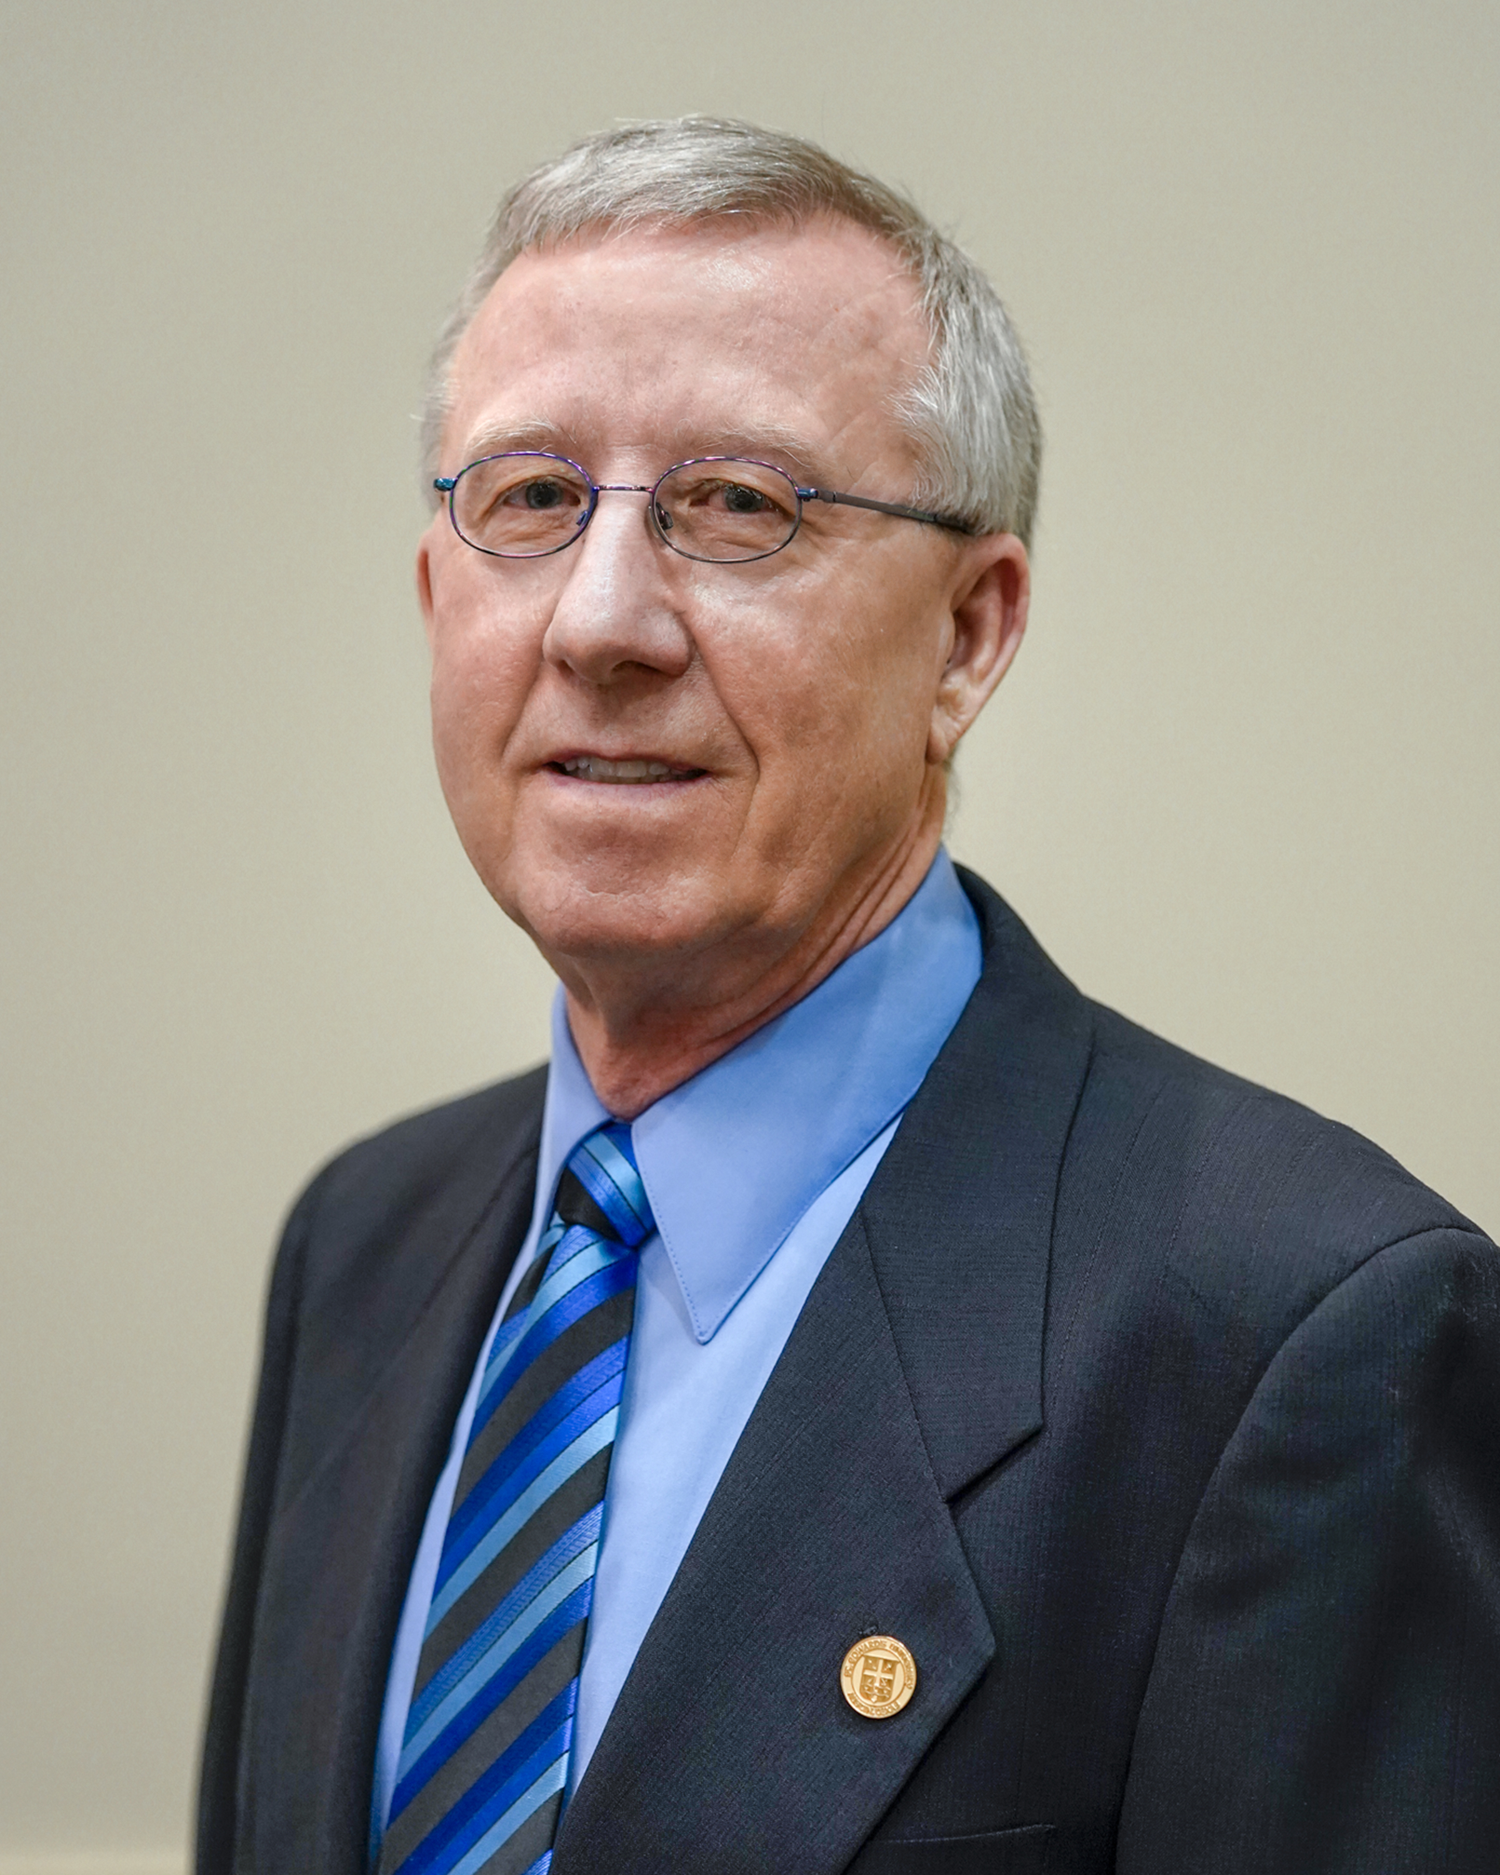 Richard Kopec